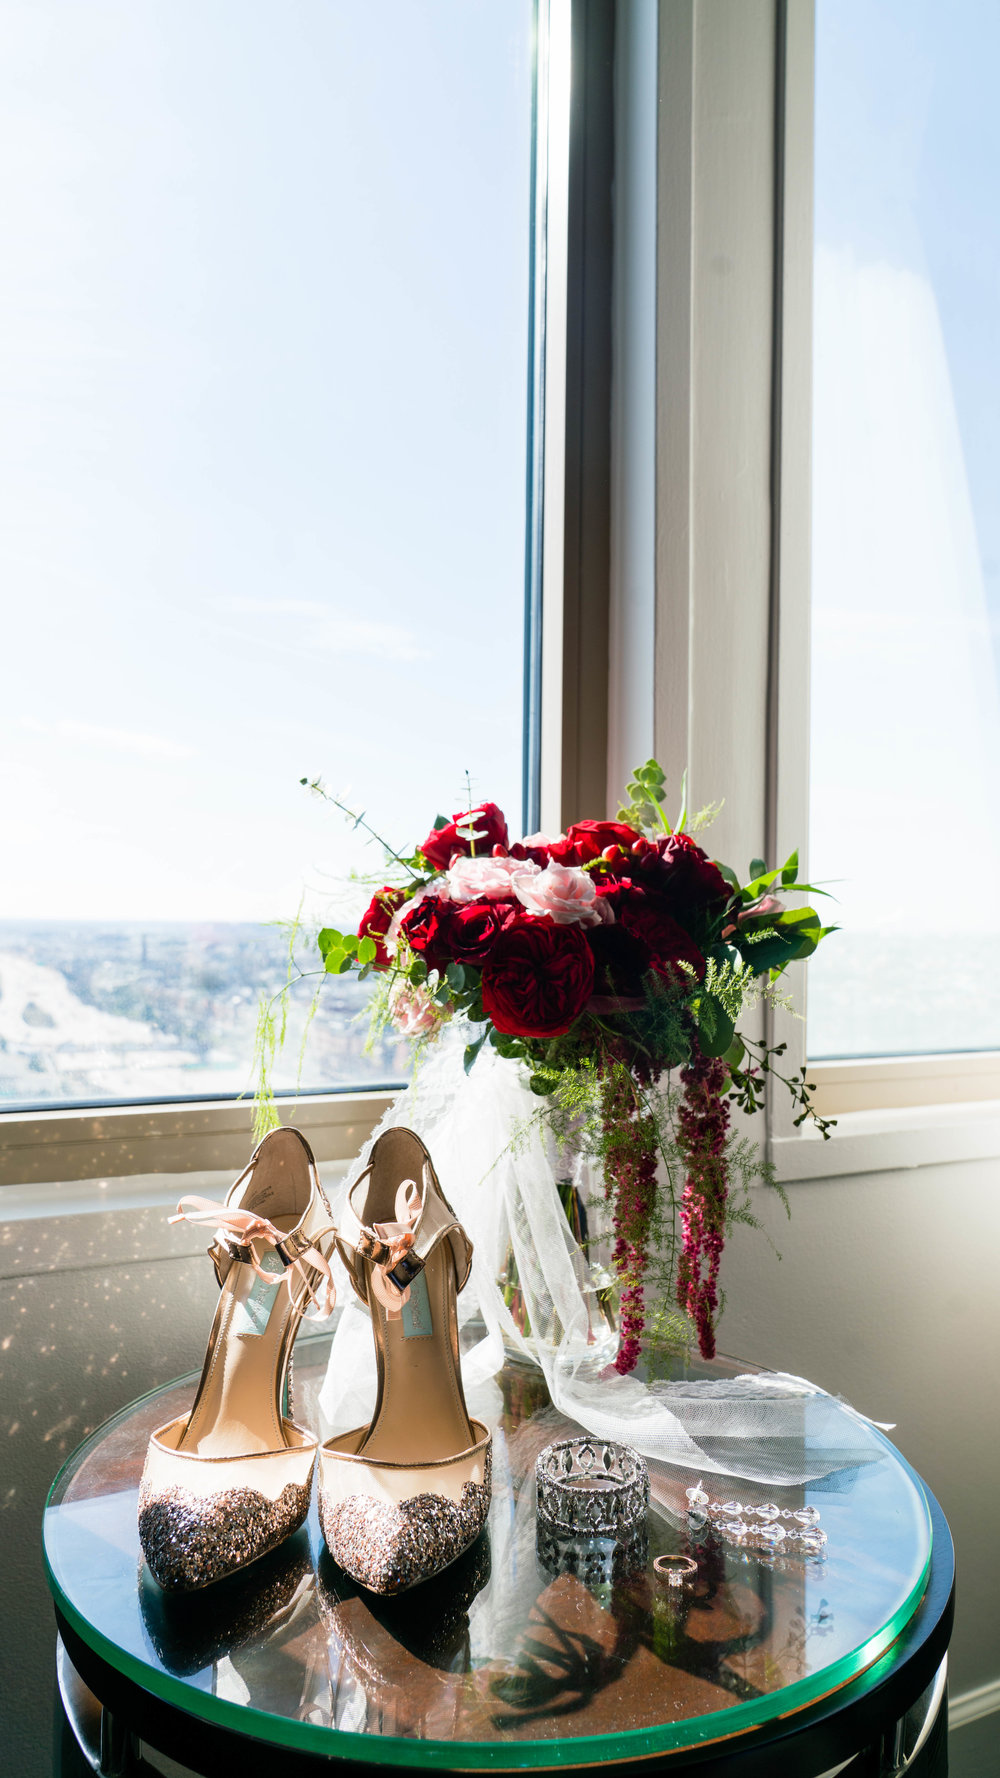 VIE WEDDING PHOTOS - CESCAPHE EVENT GROUP - LOVESTRUCK PICTURES -005.jpg